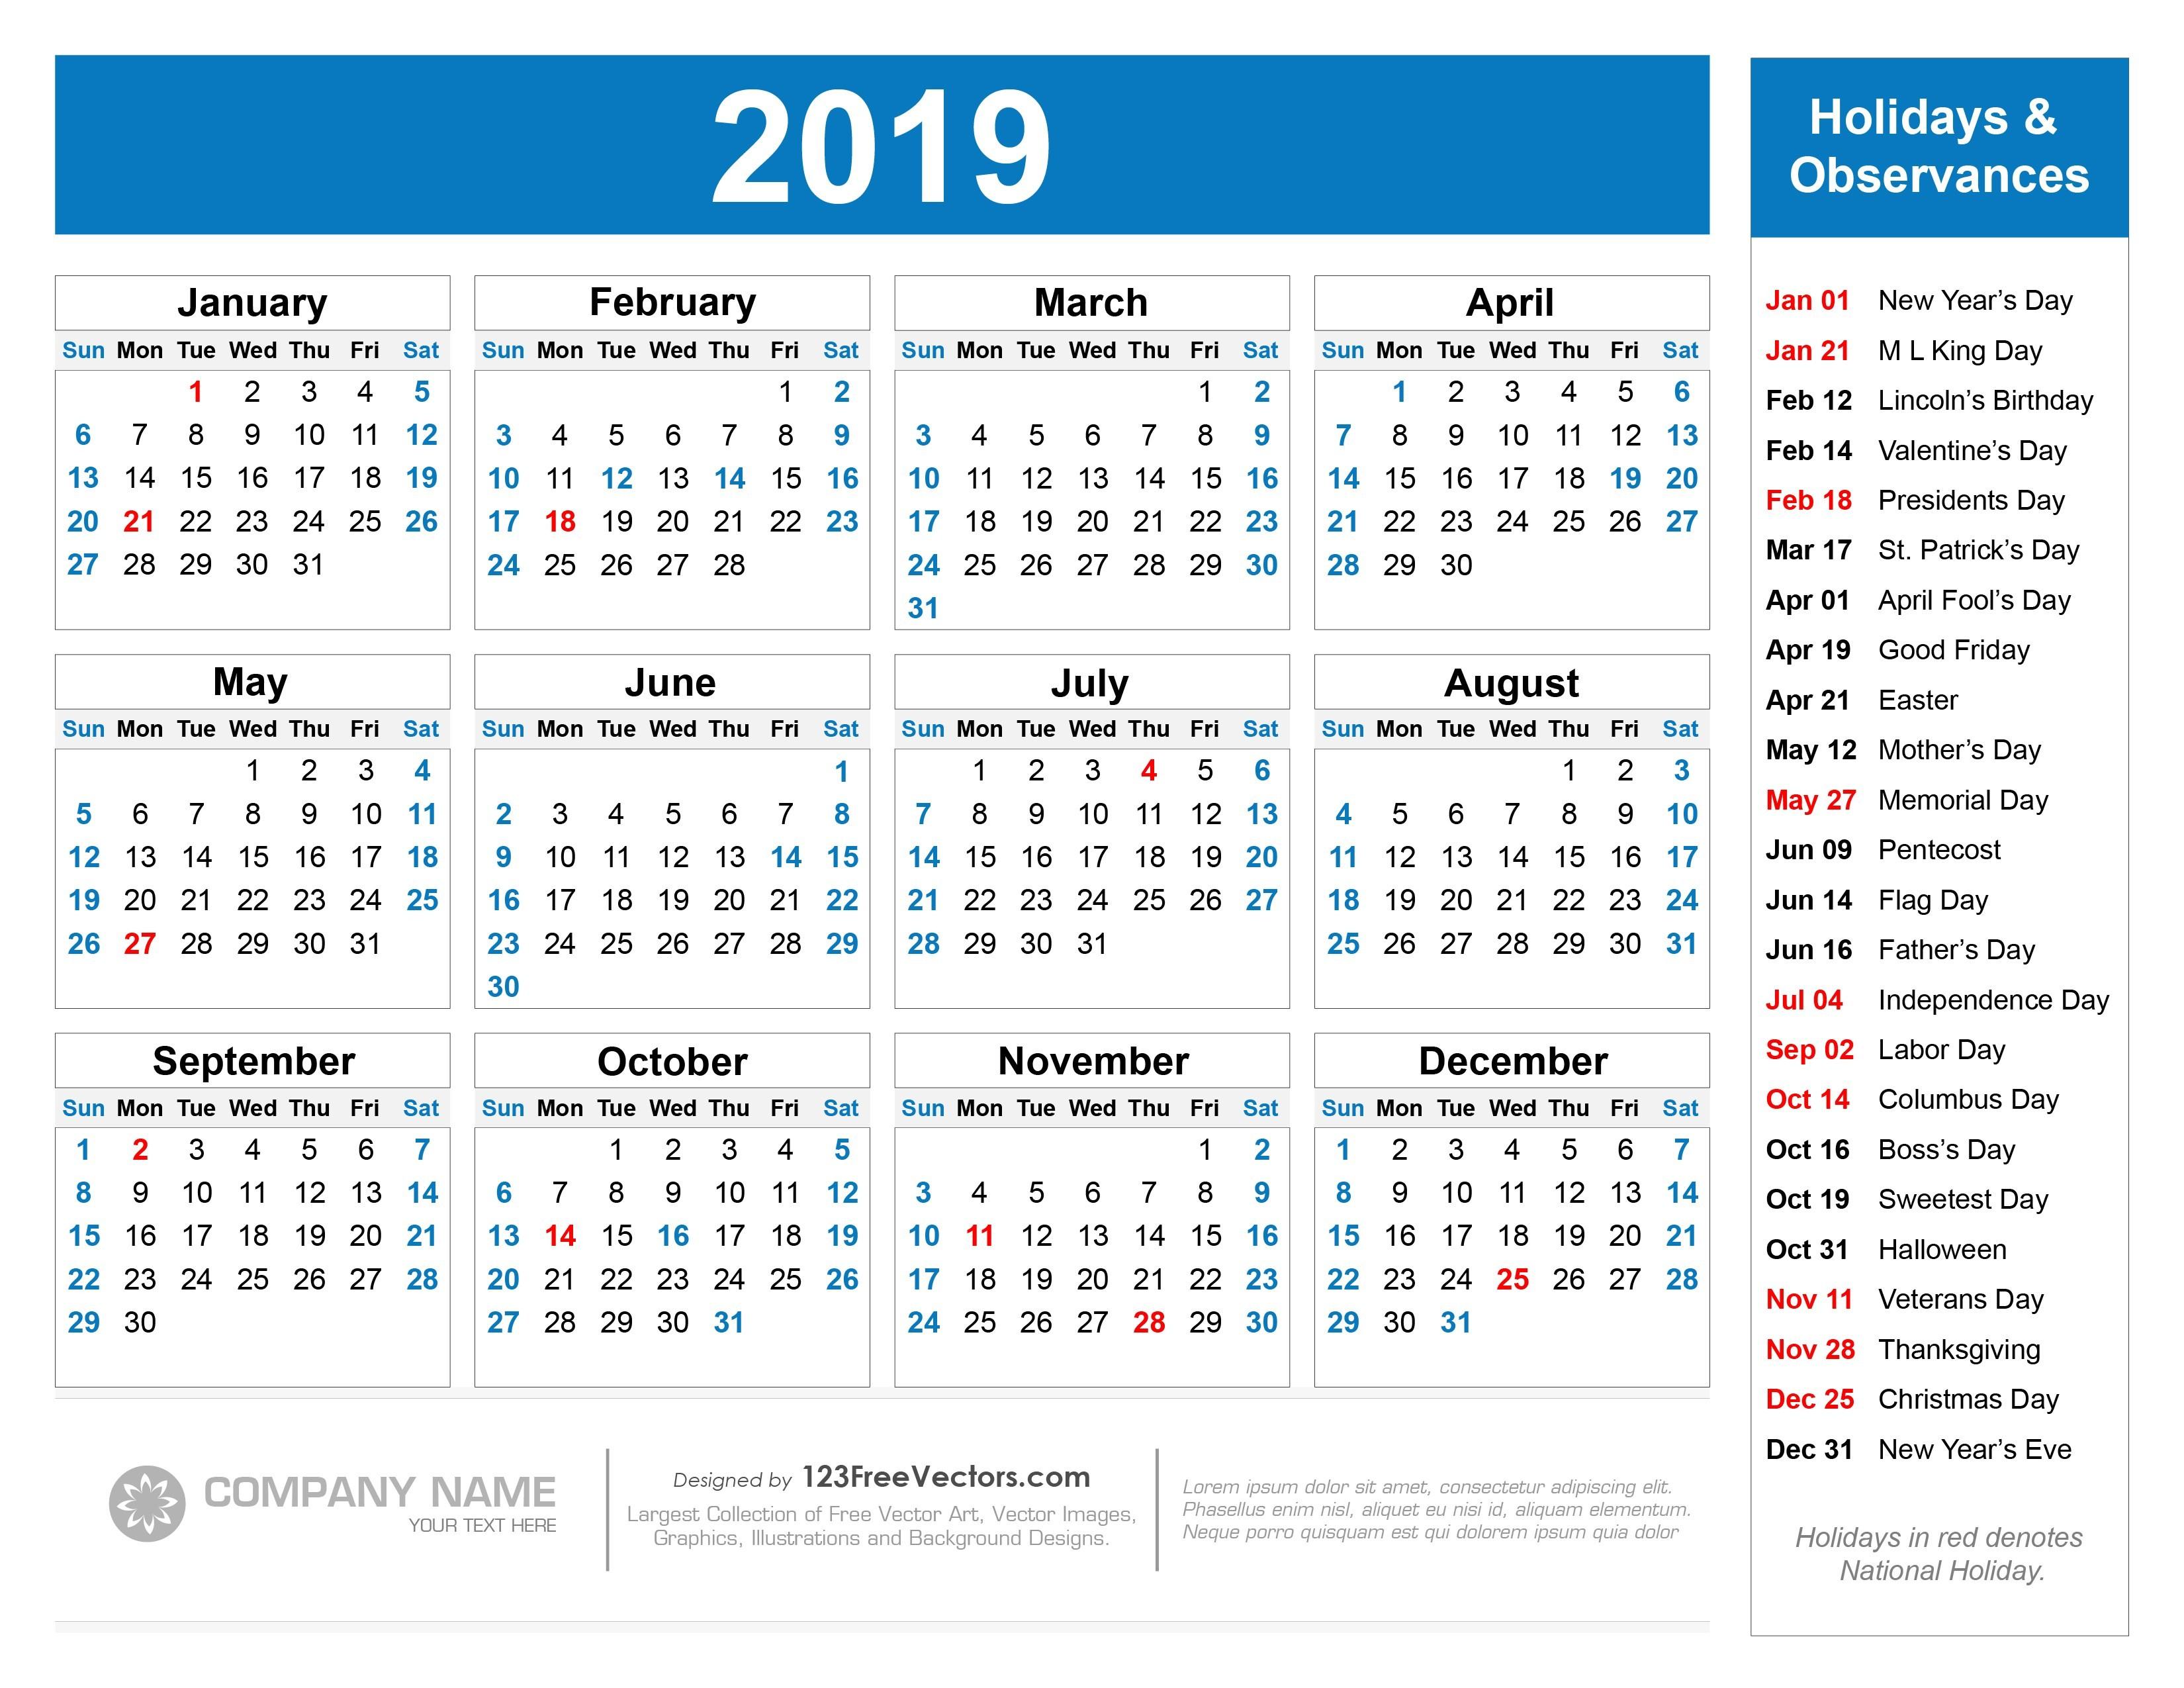 2019 Calendar with Holidays Printable Free Printable 2019 Calendar with Holidays